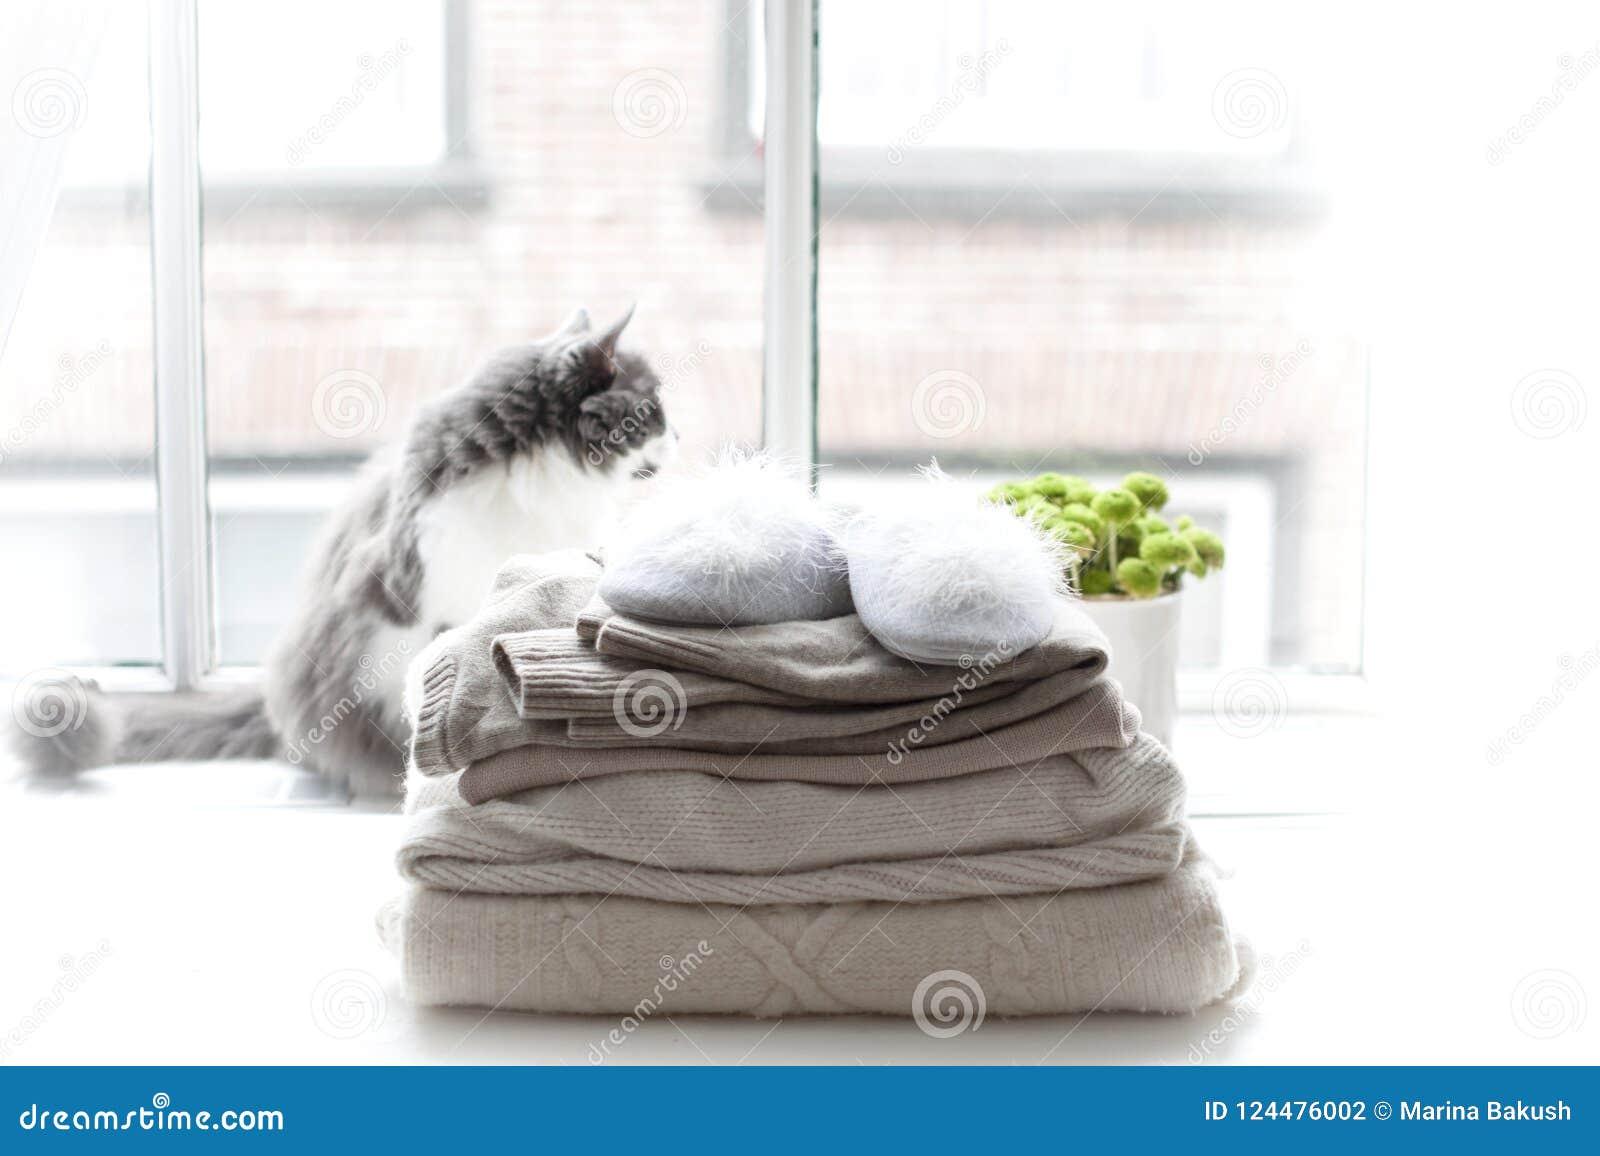 Home Cat On The Window ff9ec6934